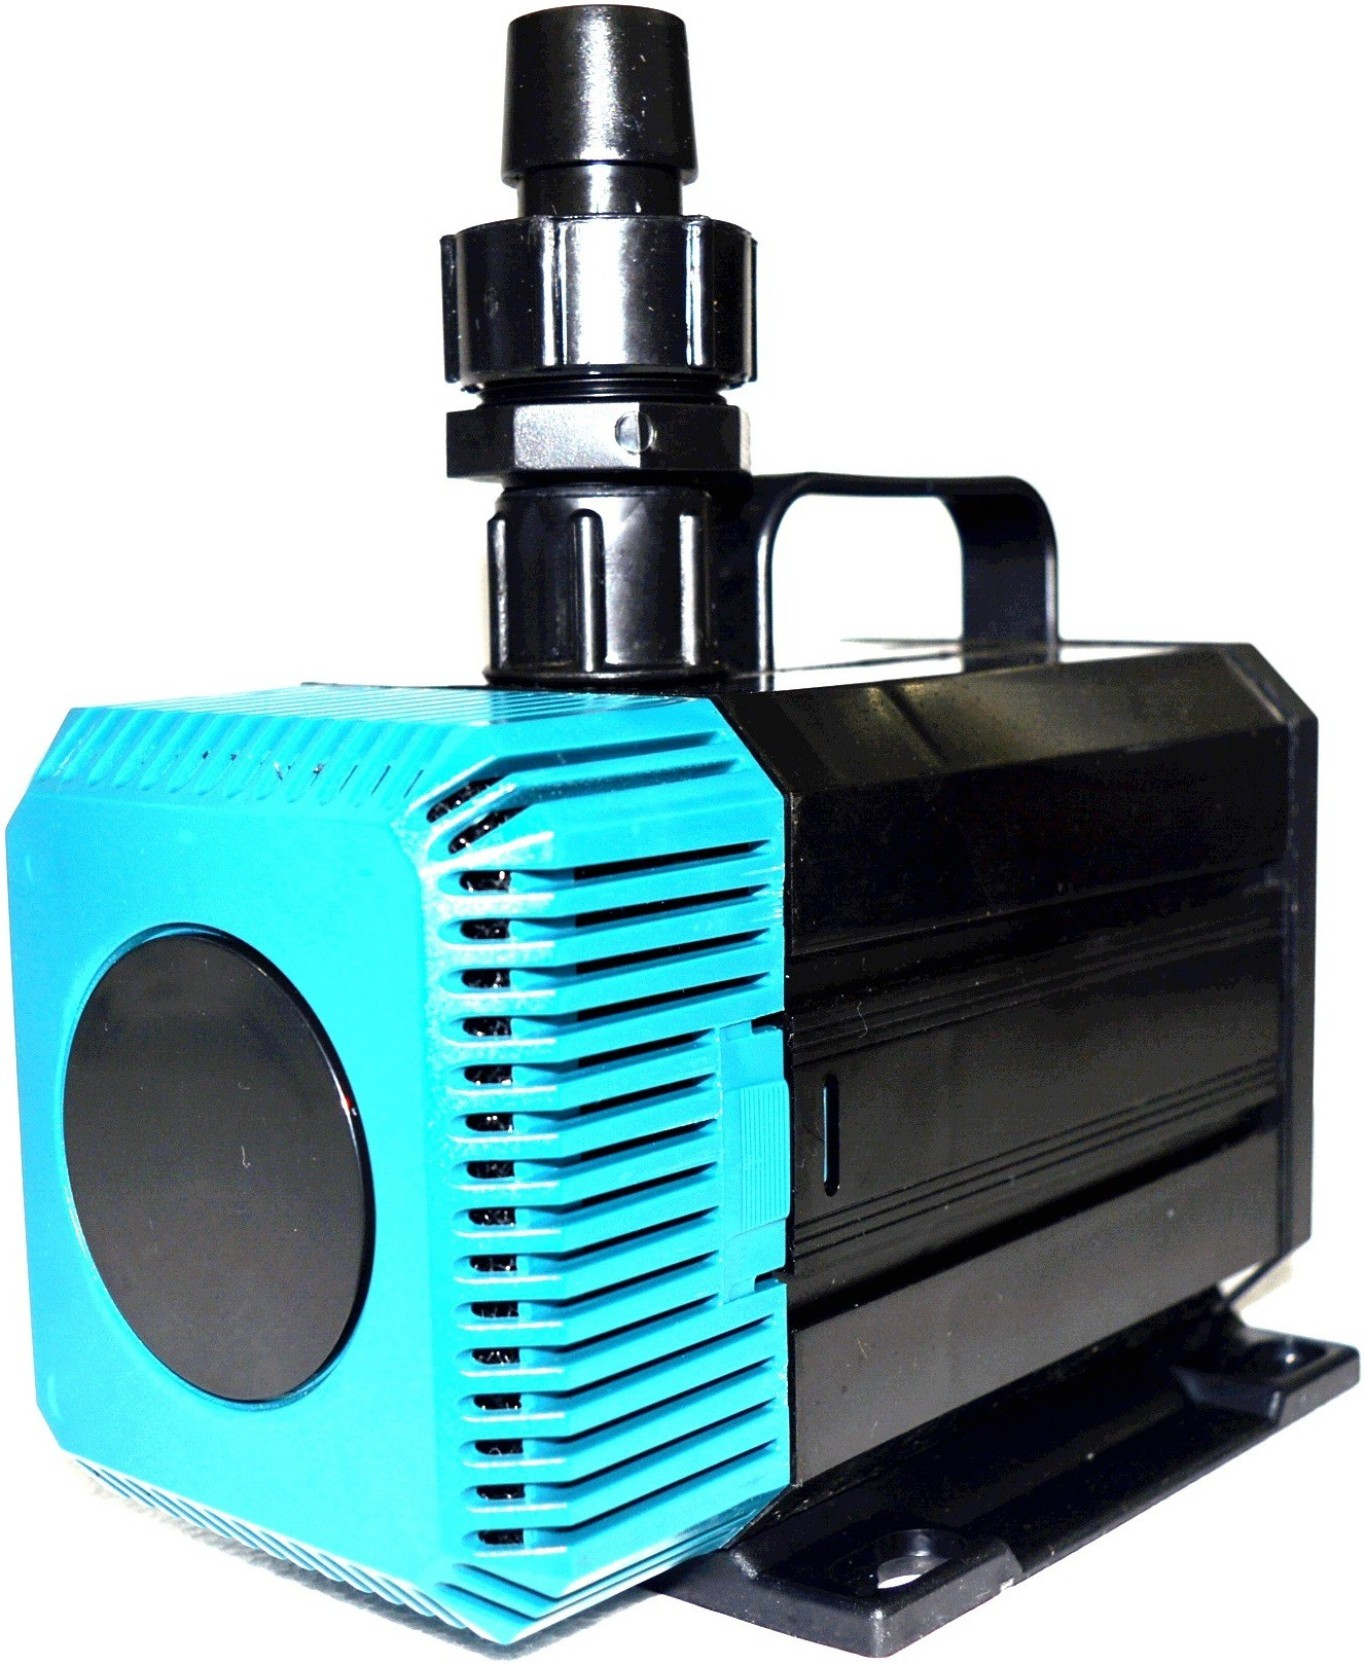 Sobo Aquarium Submersible Pump Wp 7200 Water Aquarium Pump